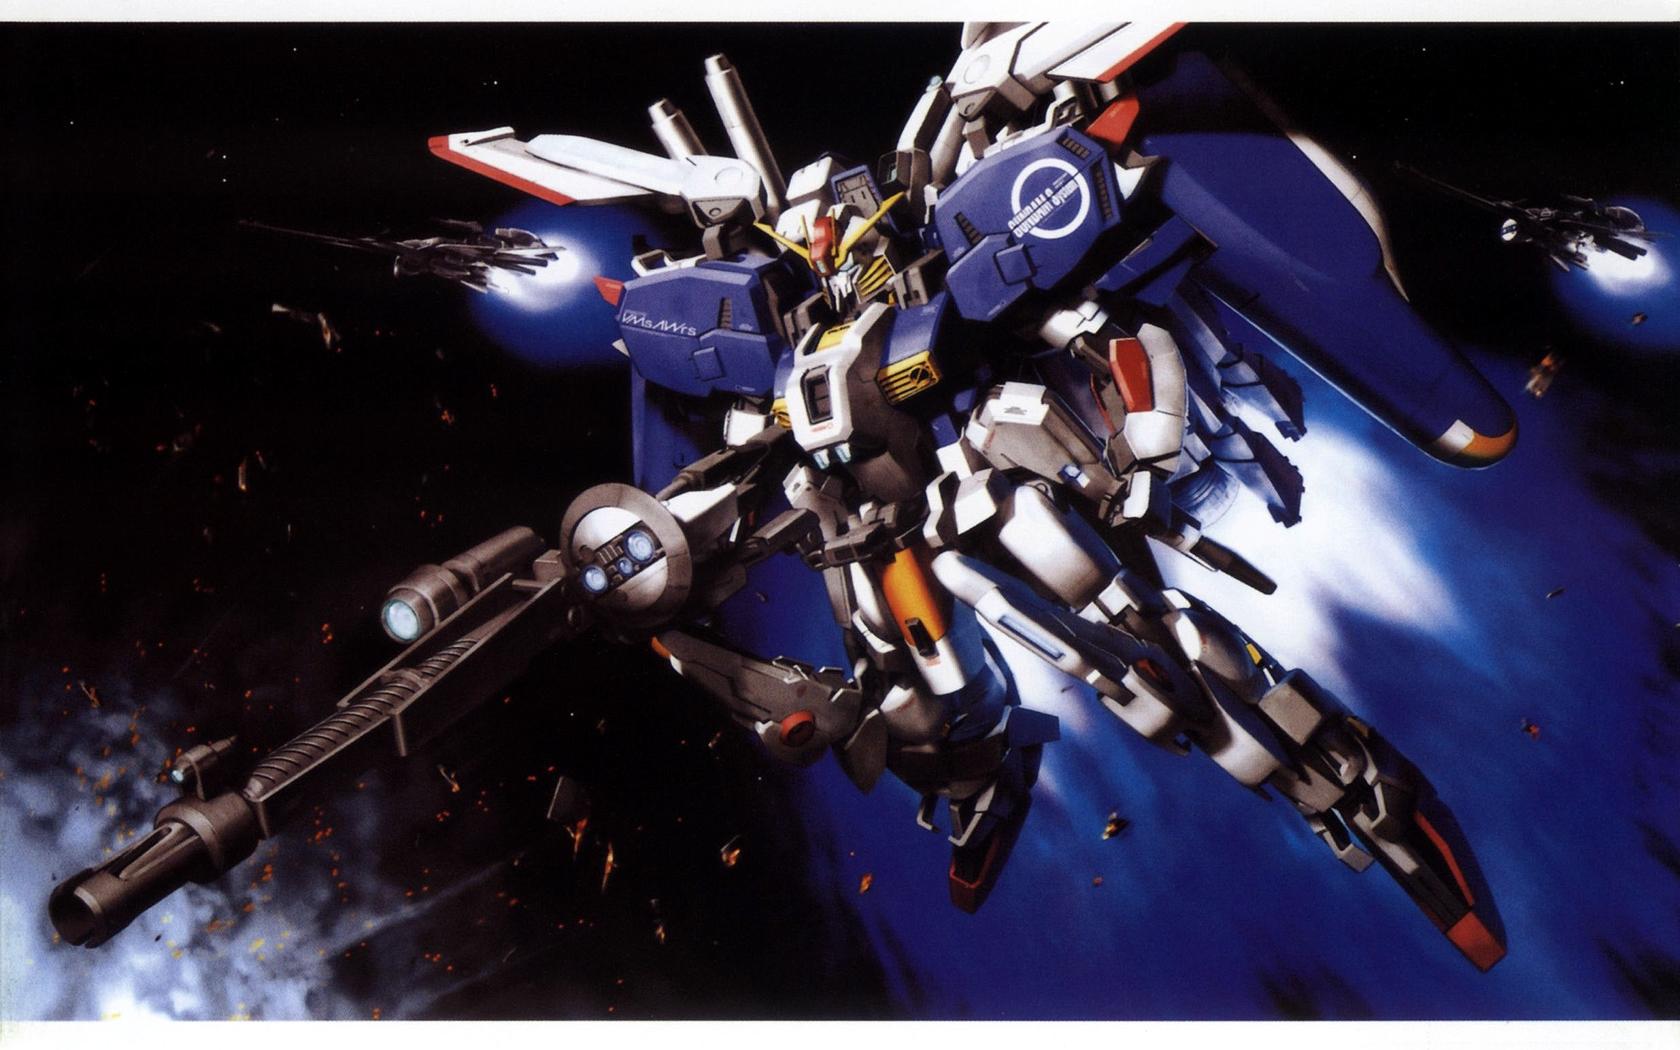 Gundam wallpaper wallpapersafari - Gundam wallpaper hd ...